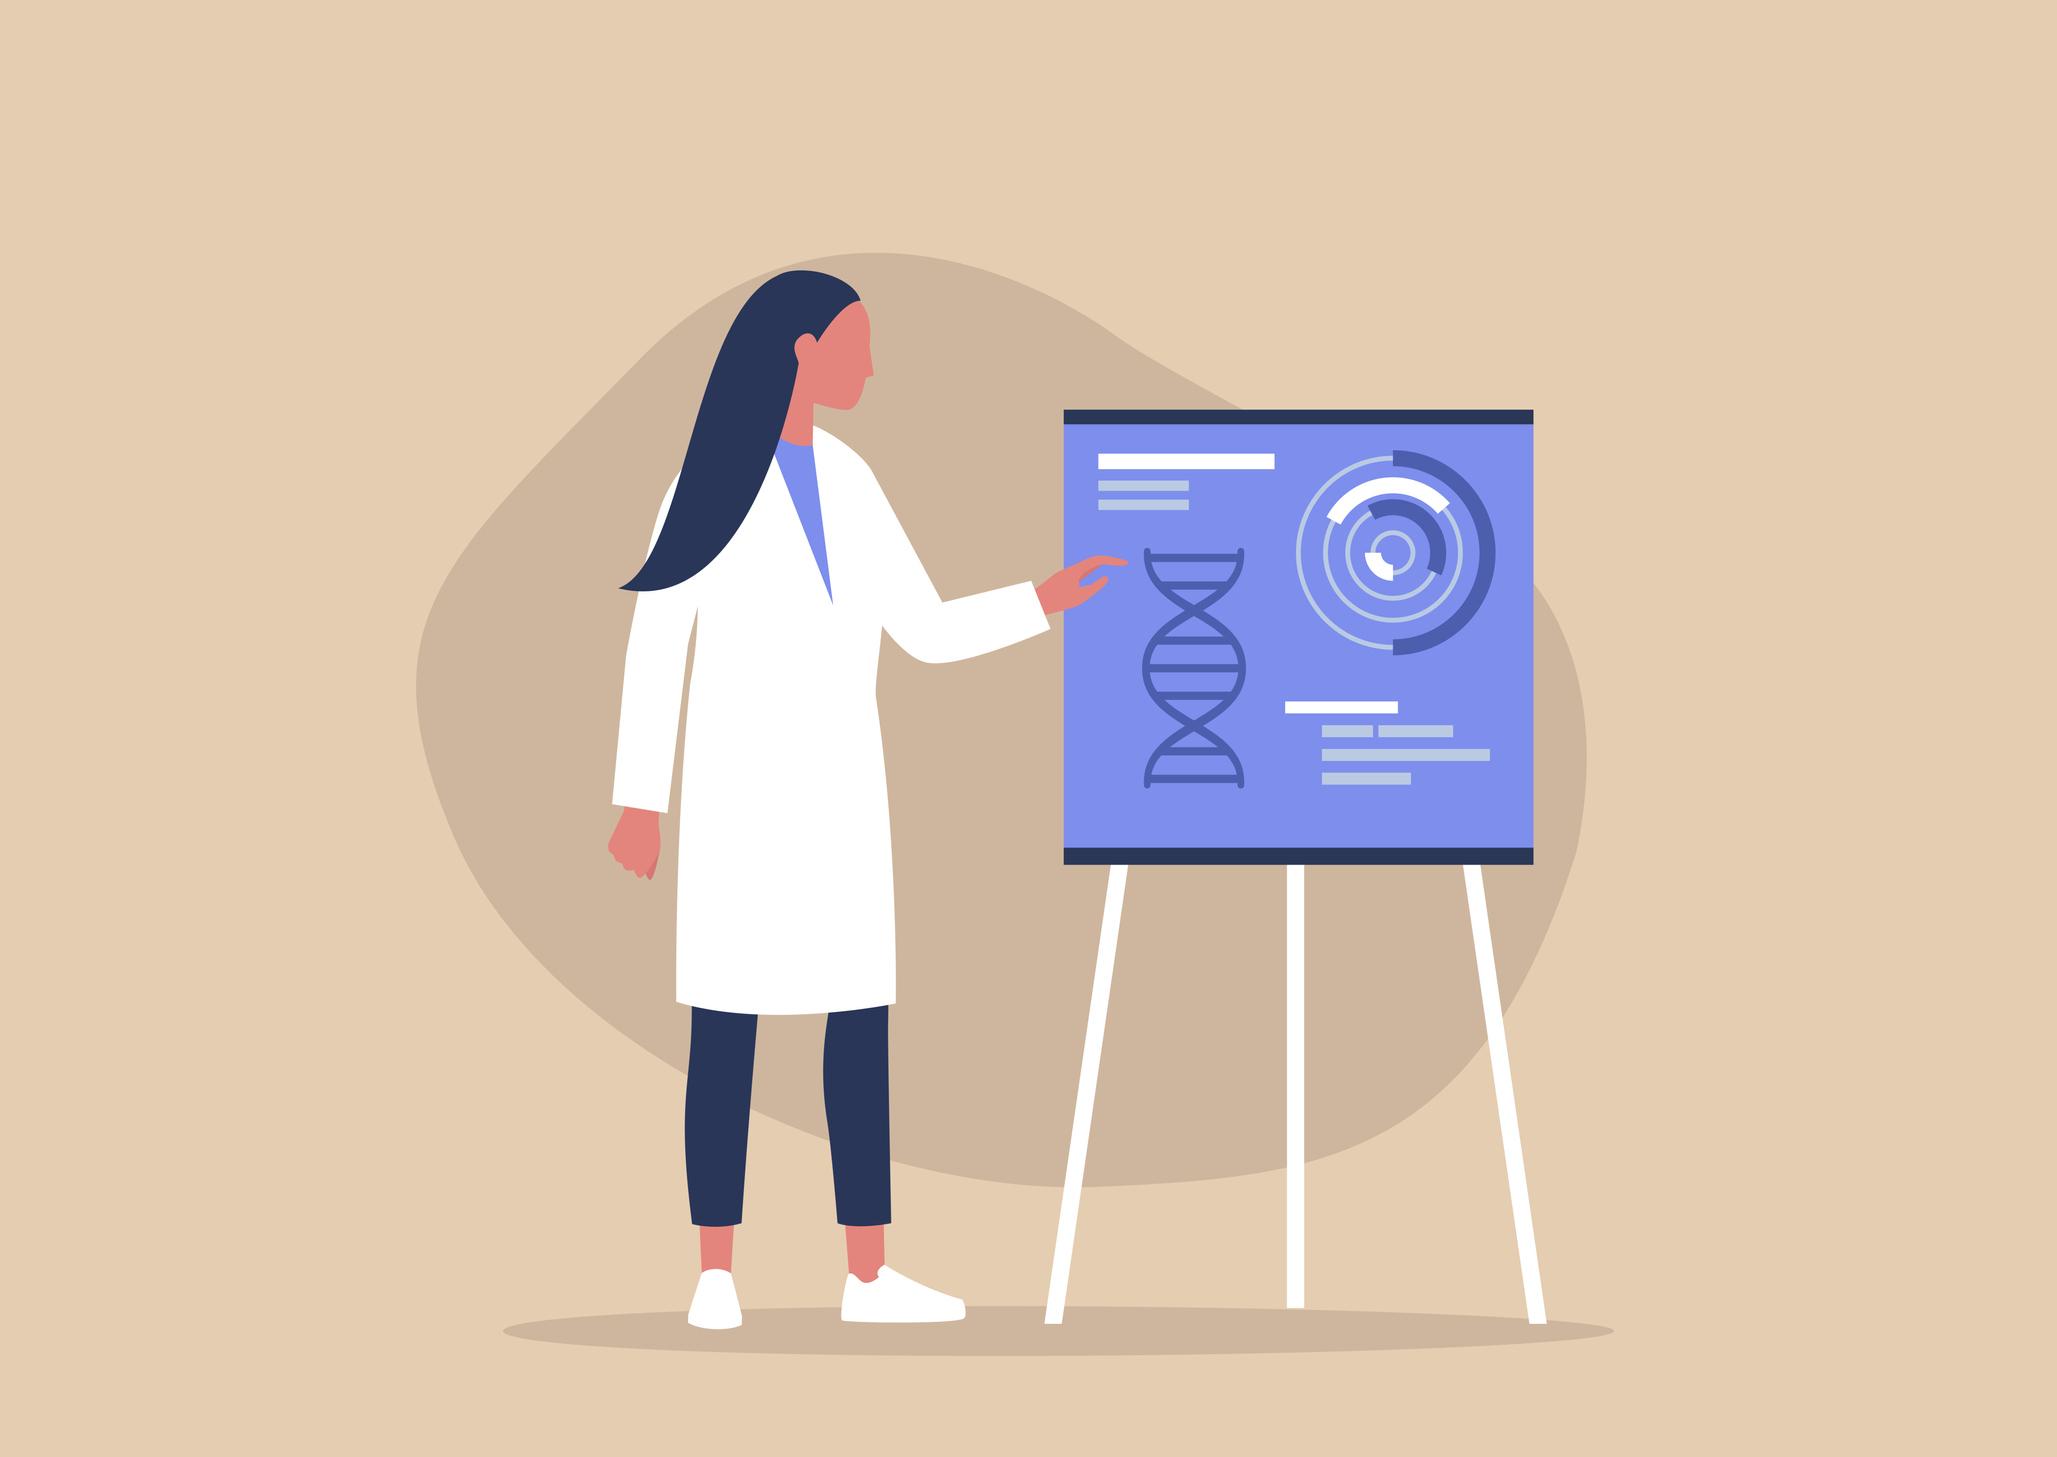 Future Founders Initiative aims to increase female entrepreneurship in biotech